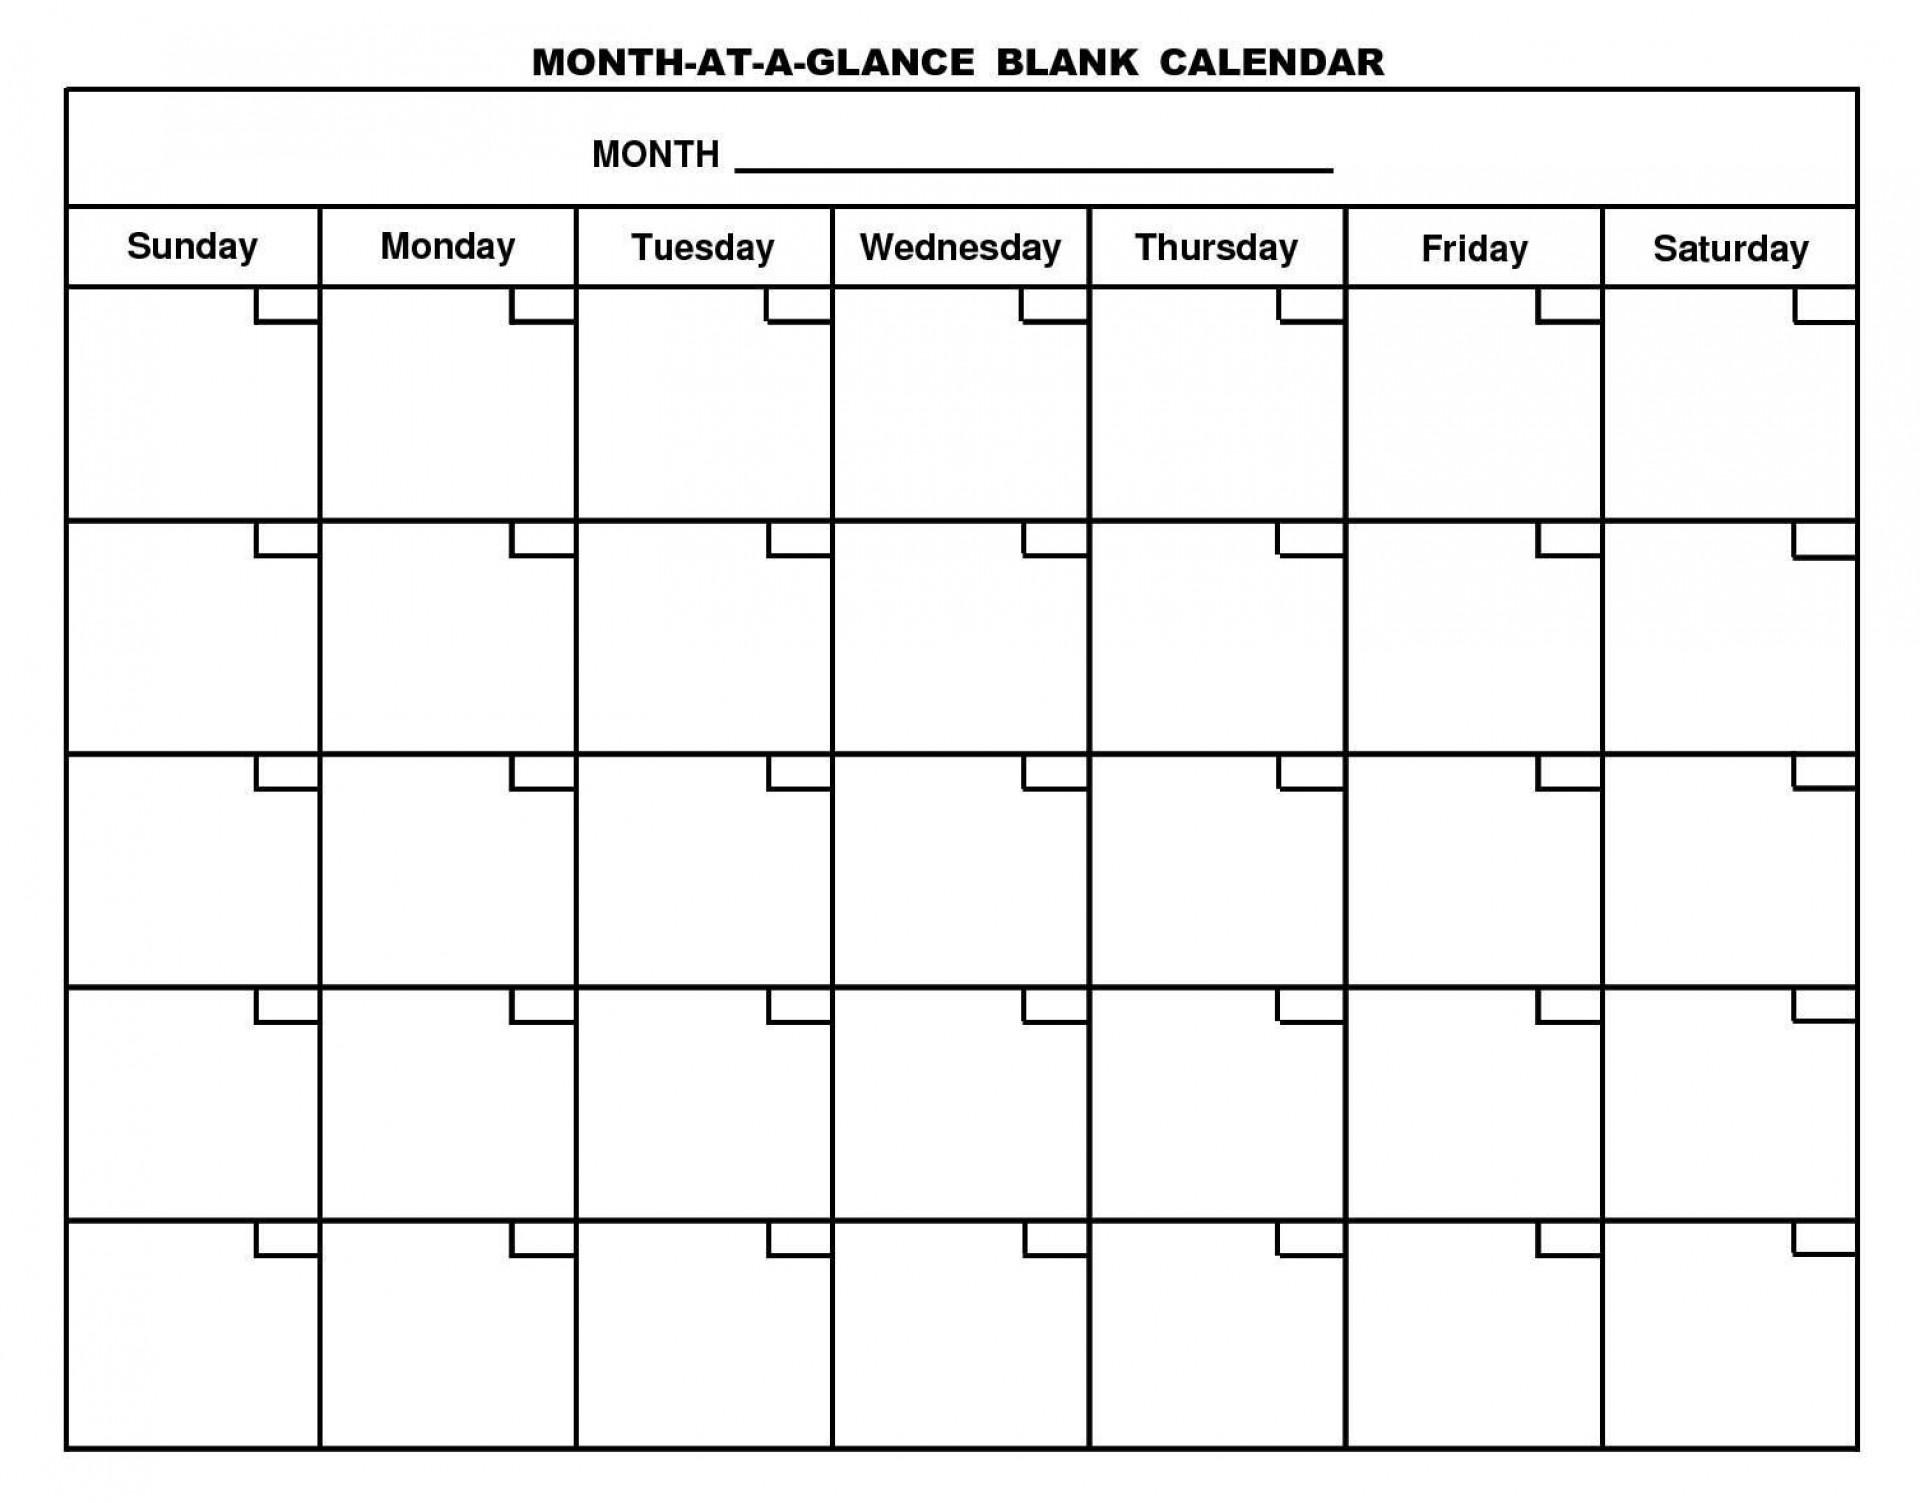 001 Rare Free Printable Blank Monthly Calendar Template High Resolution 1920